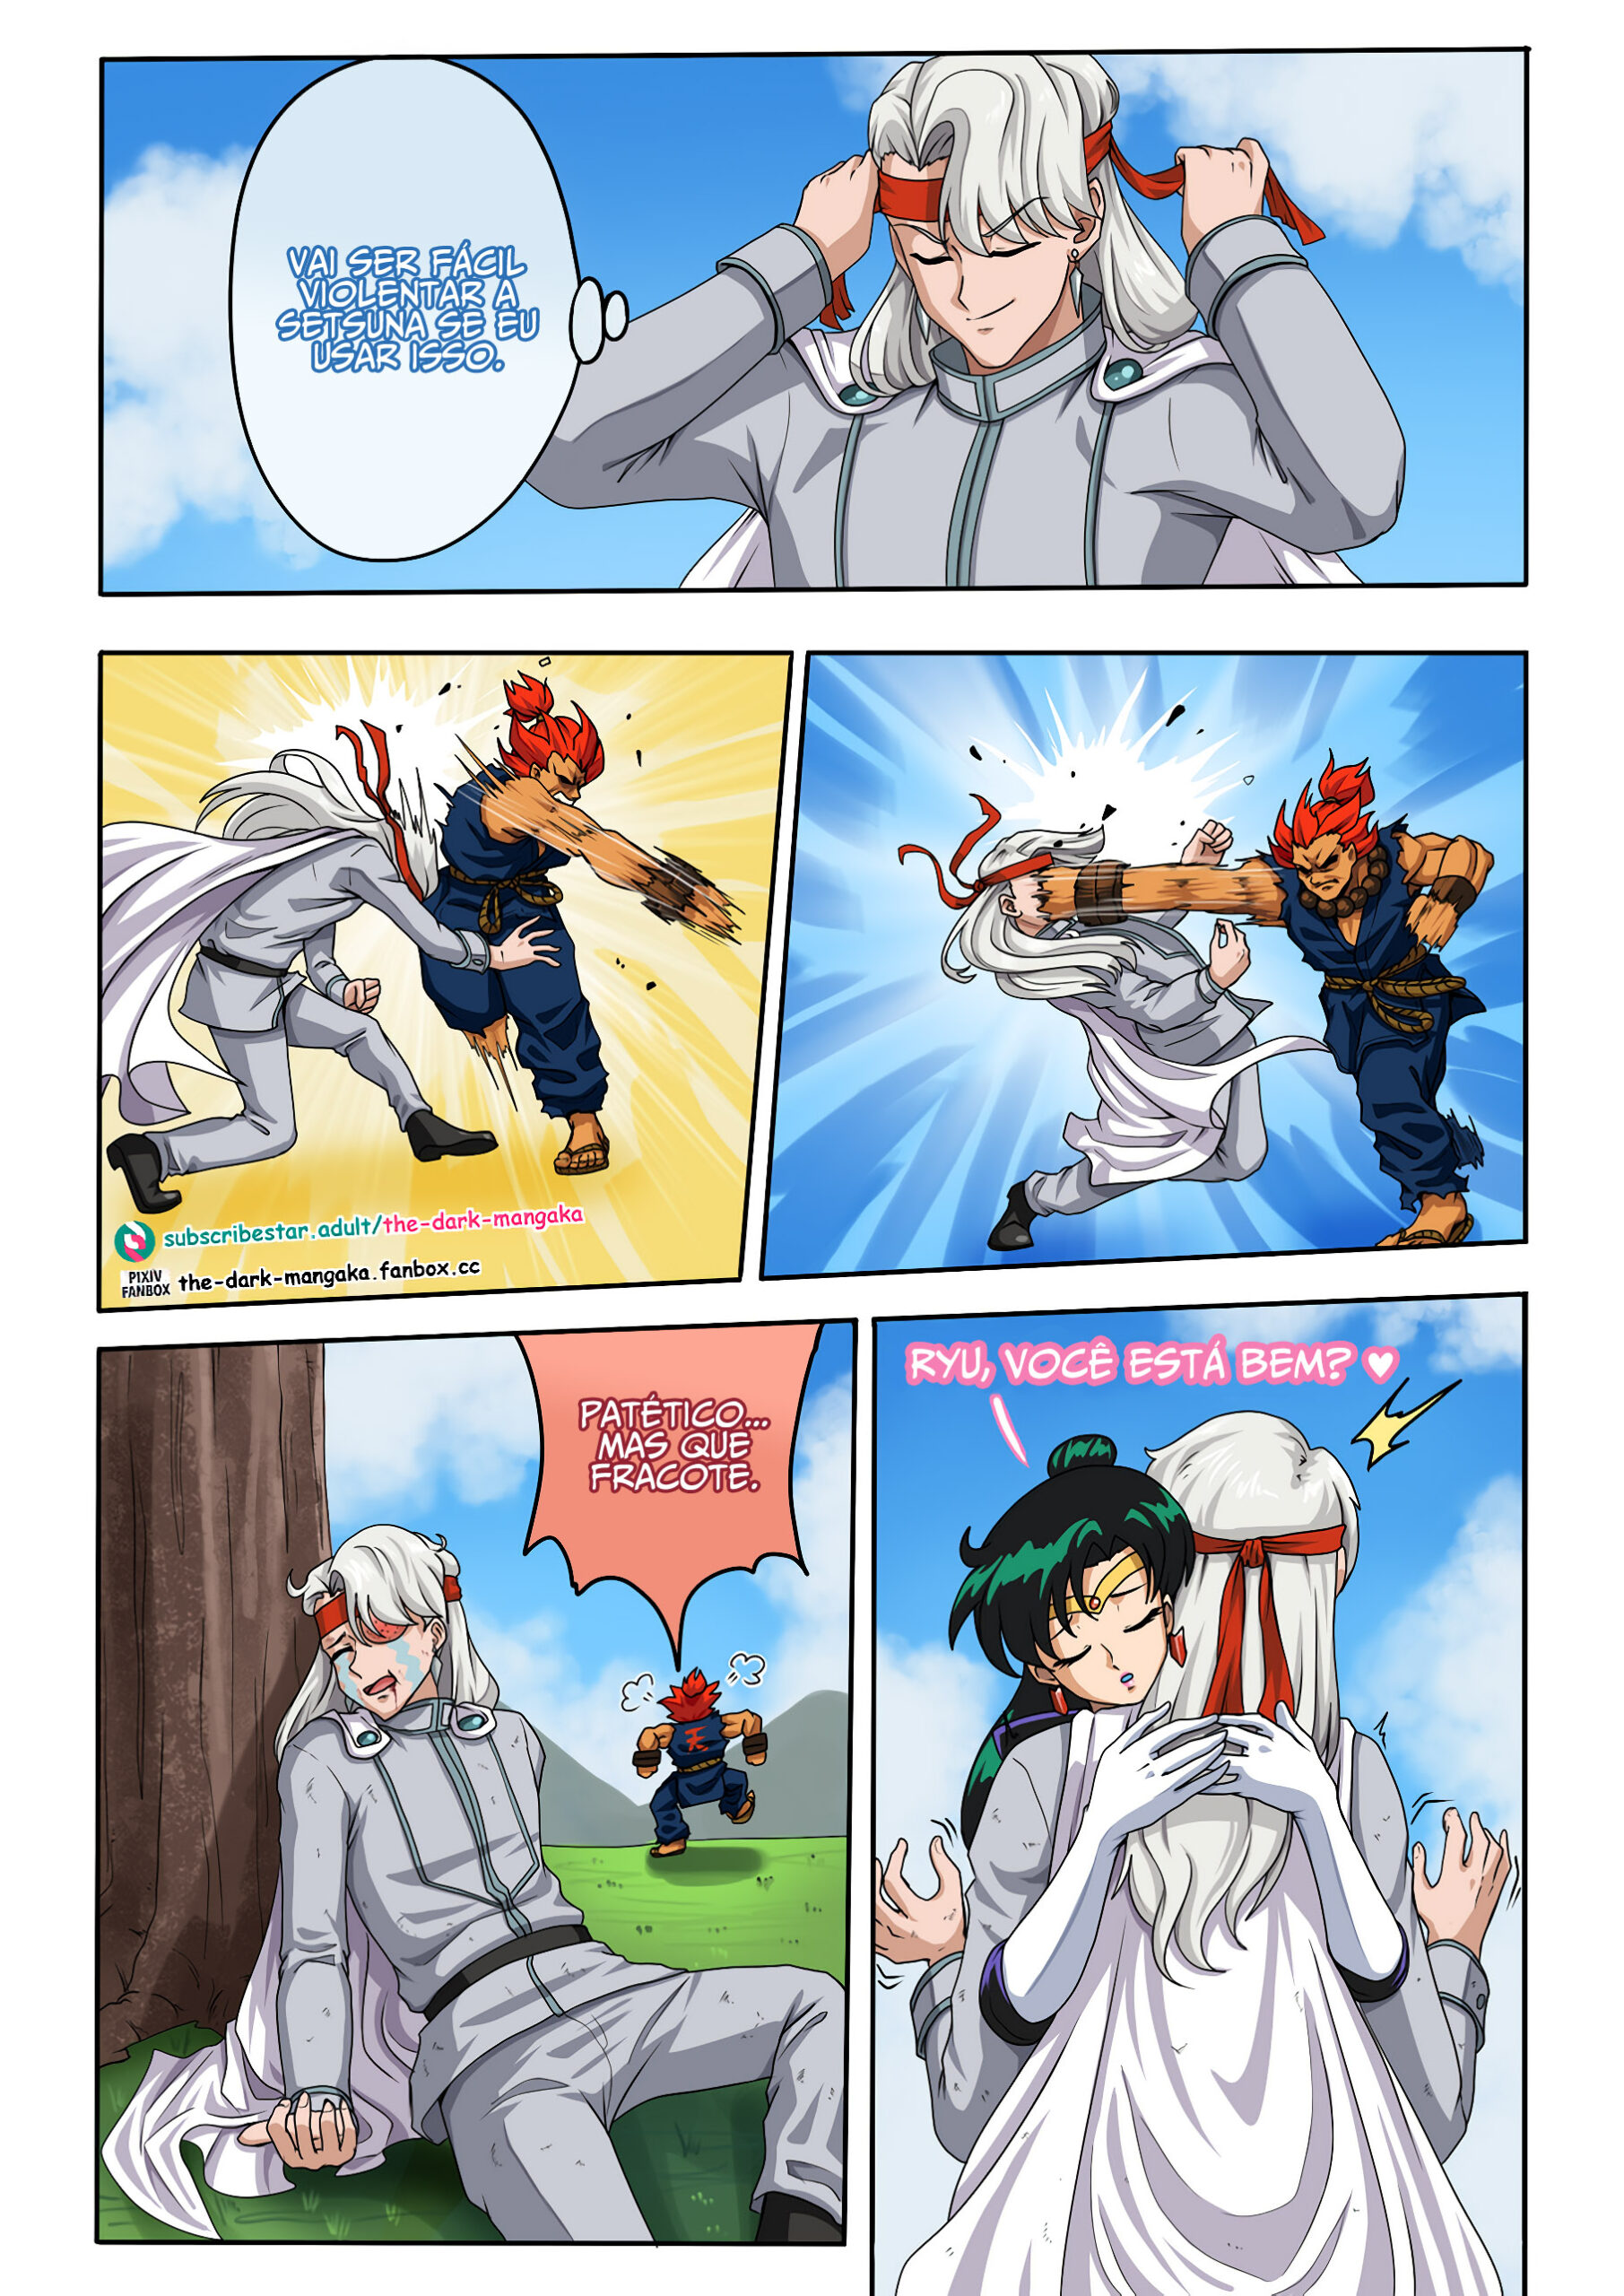 A bandana magica